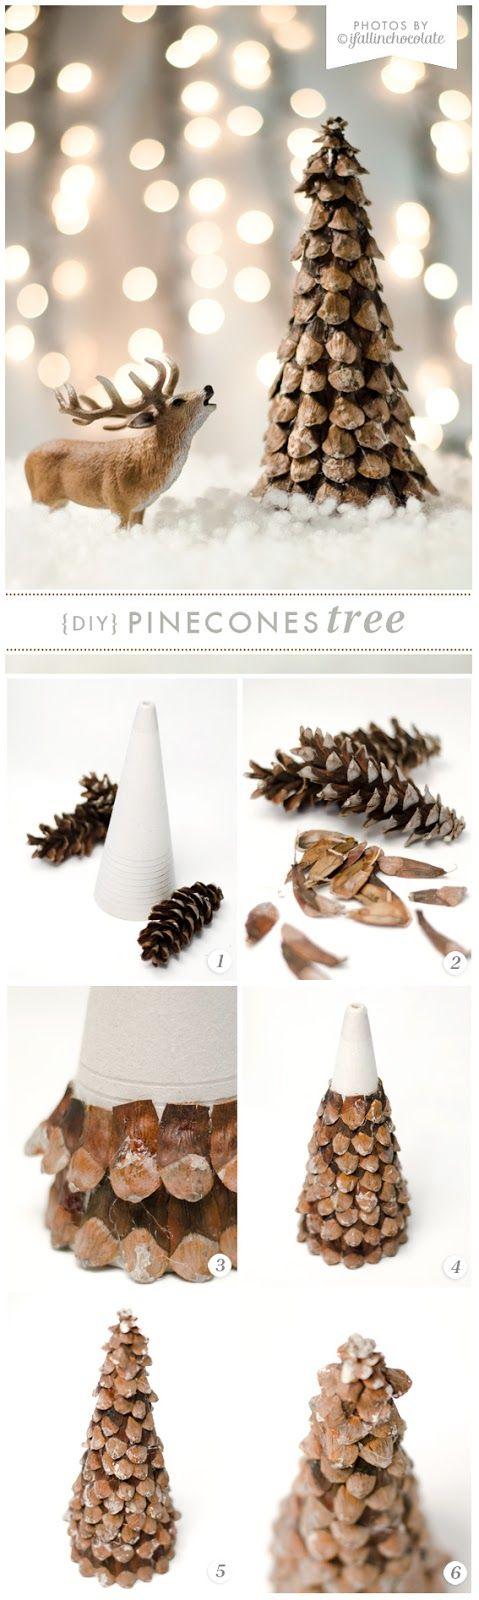 I Fall in Chocolate: DIY PINECONE XMAS TREE